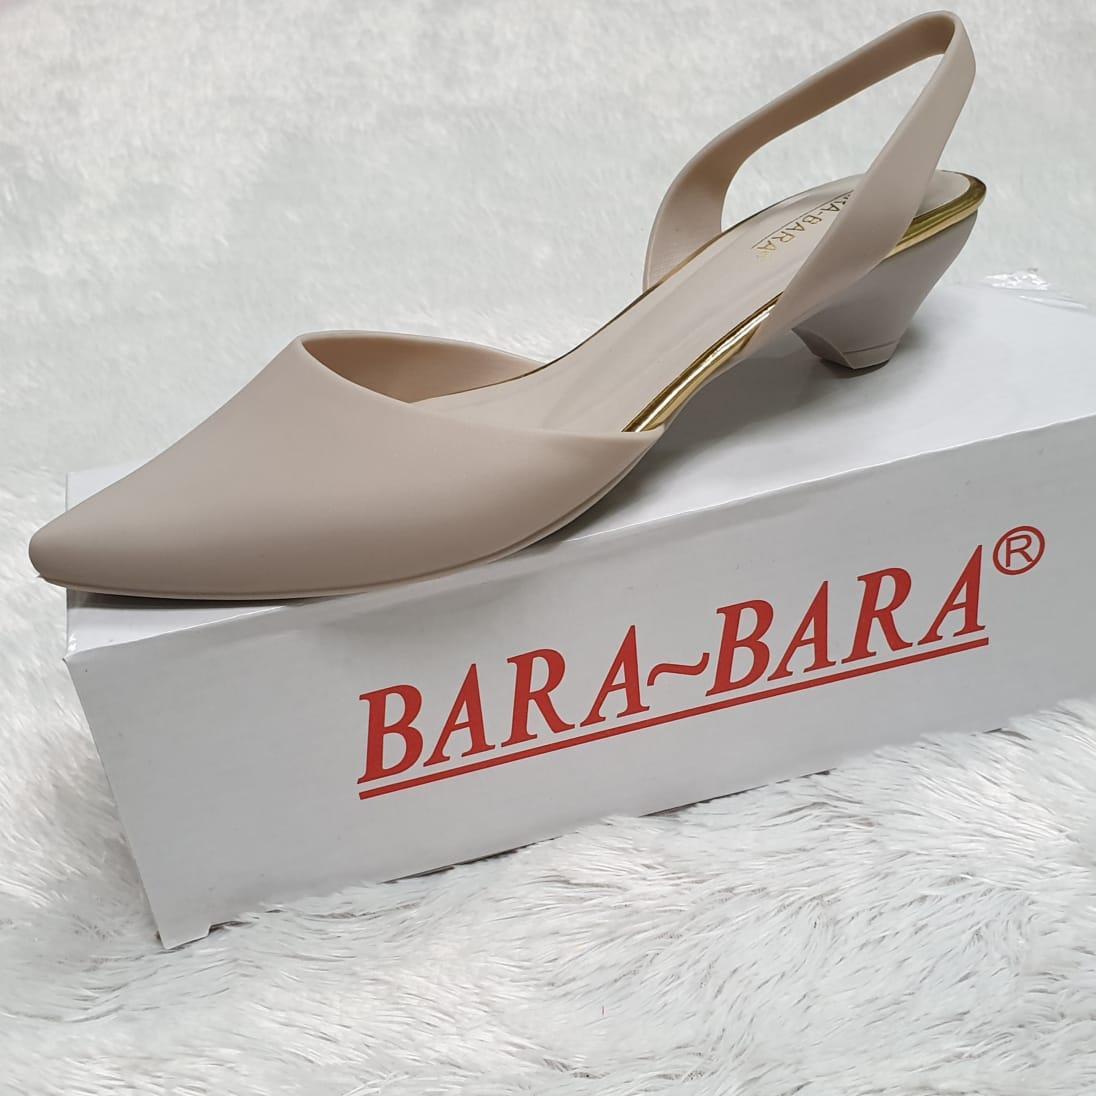 86c9ae5cae96 Bara ~ Bara - Jelly Shoes - Flat Shoes Wanita Hak 3 cm STR13A Warna Dikirim